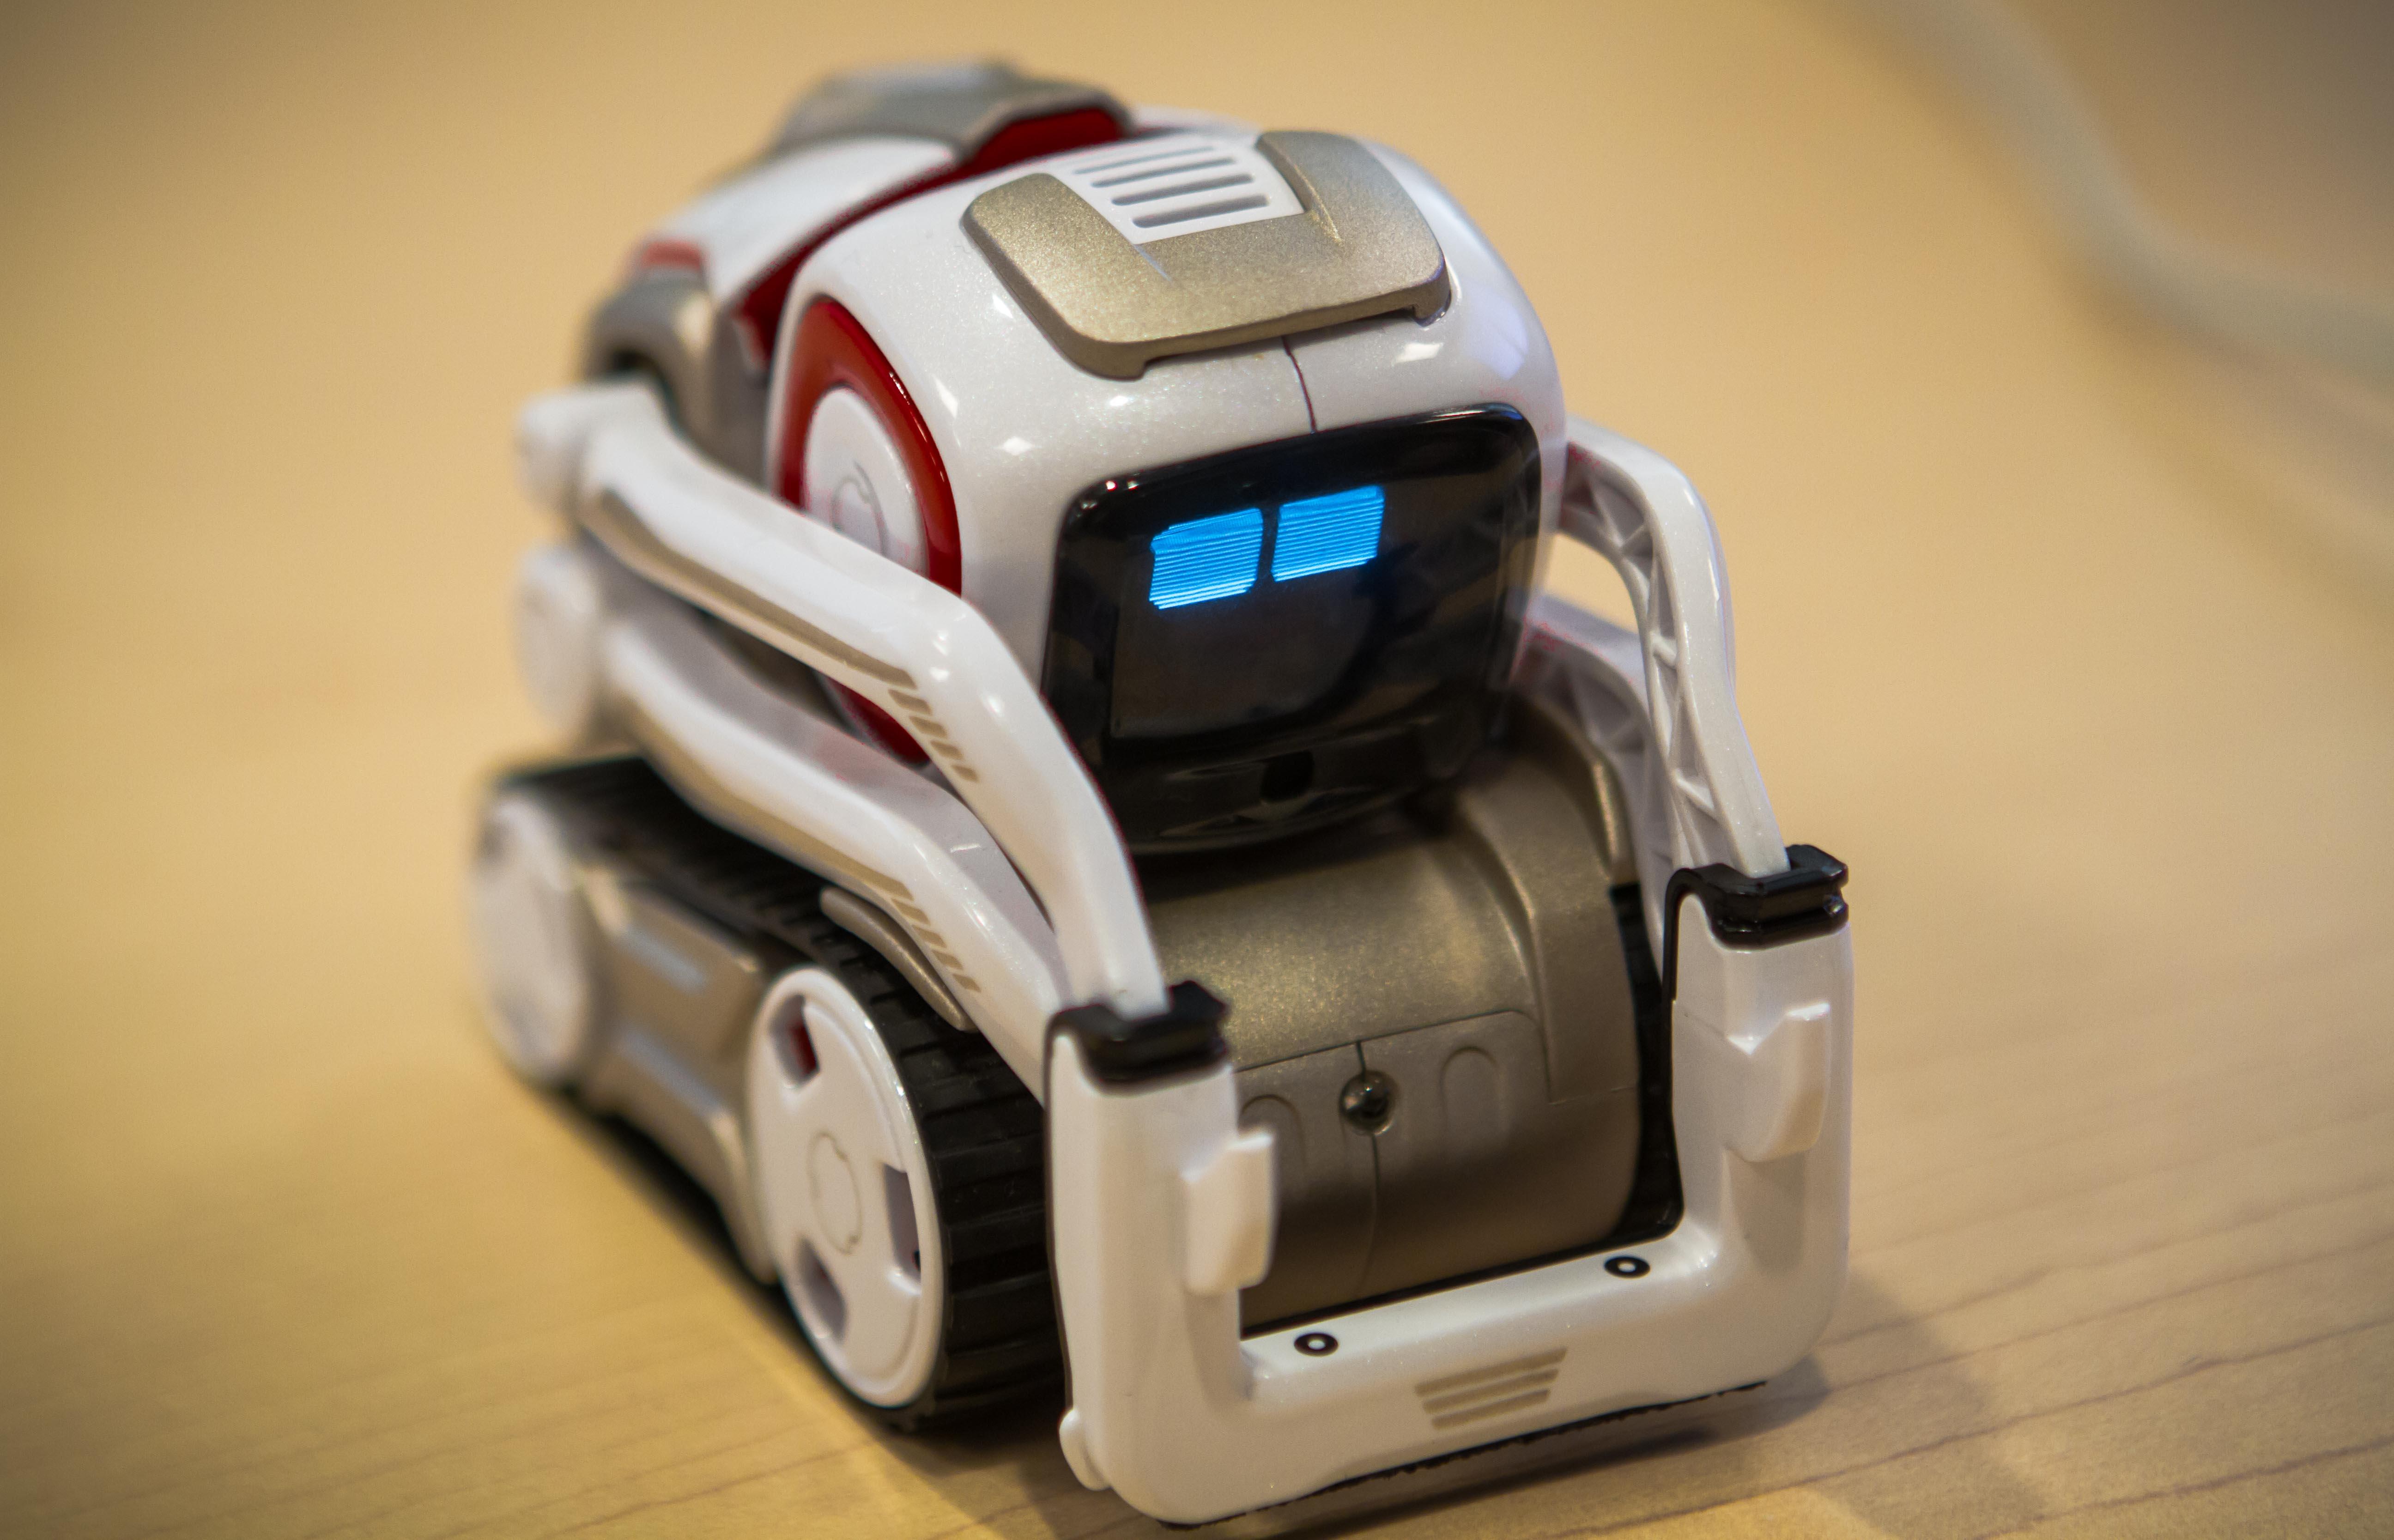 Ankis cozmo robot is an amazing sentient toy but the novelty may ankis cozmo robot is an amazing sentient toy but the novelty may wear off gamesbeat buycottarizona Gallery